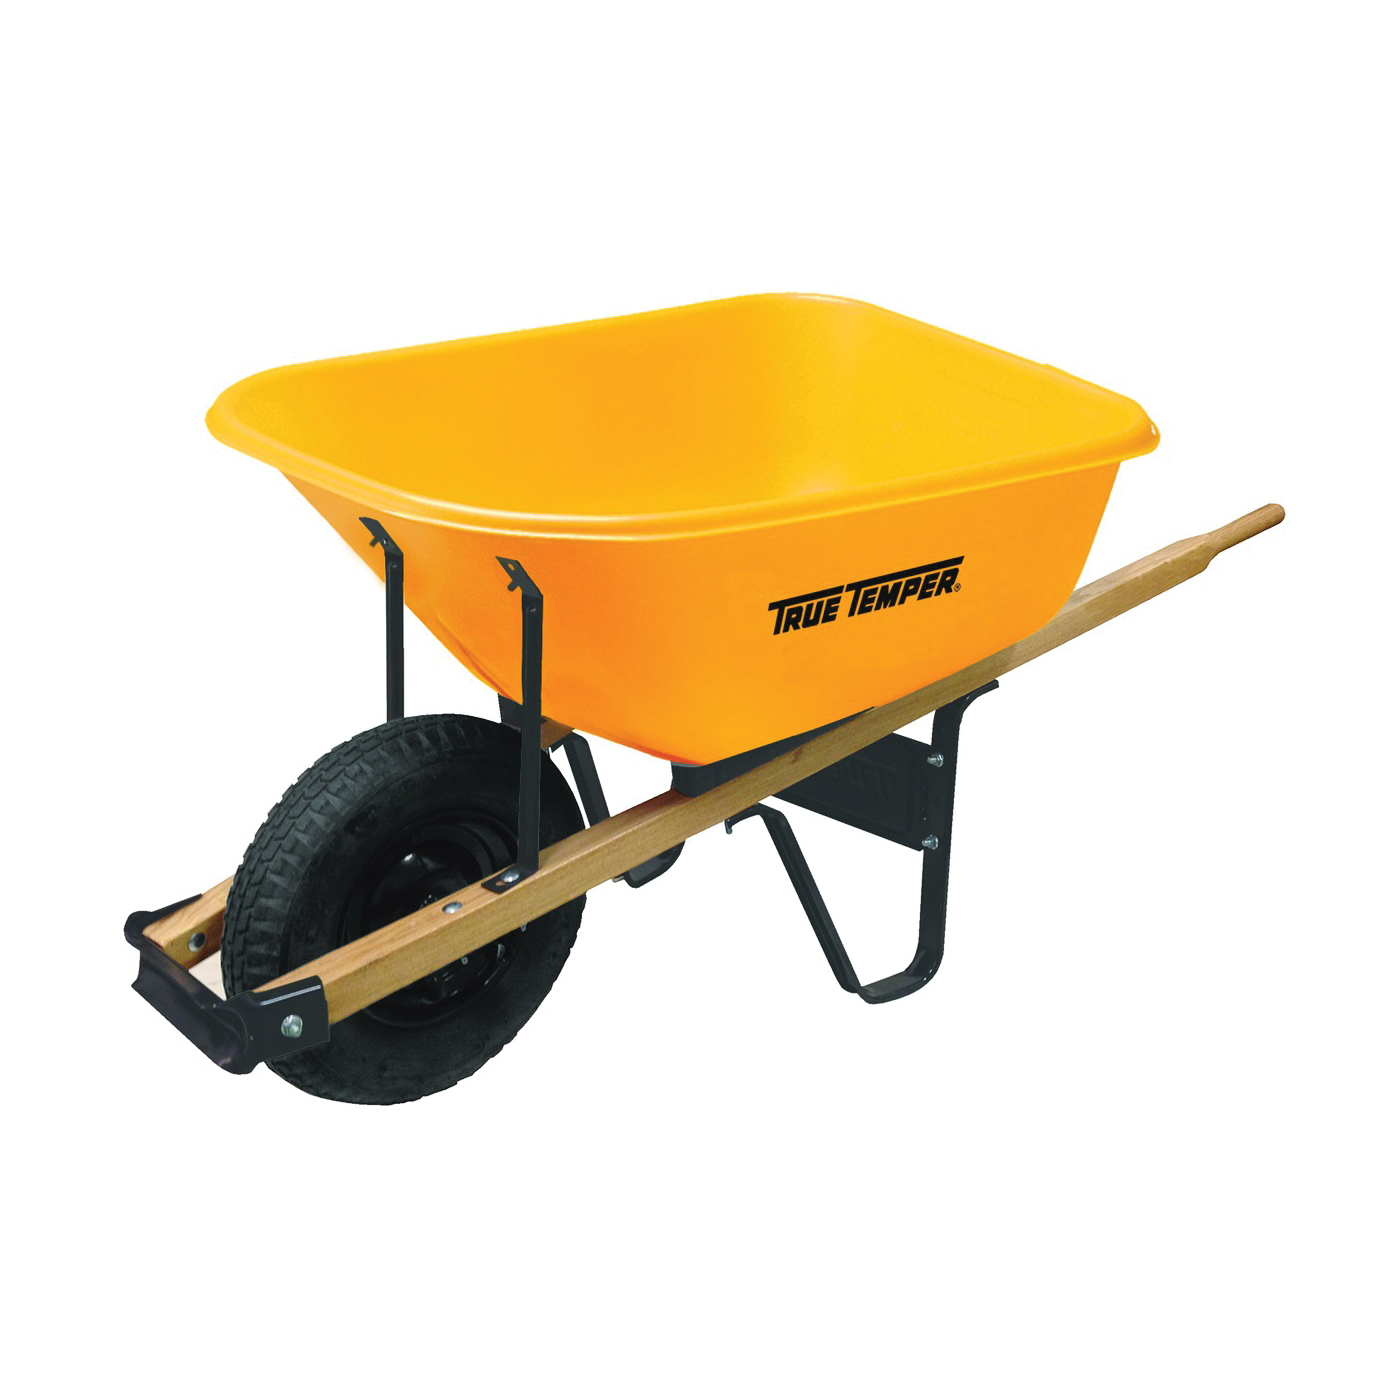 Picture of TRUE TEMPER 009970VB Wheelbarrow Tray, 6 cu-ft Capacity, Poly